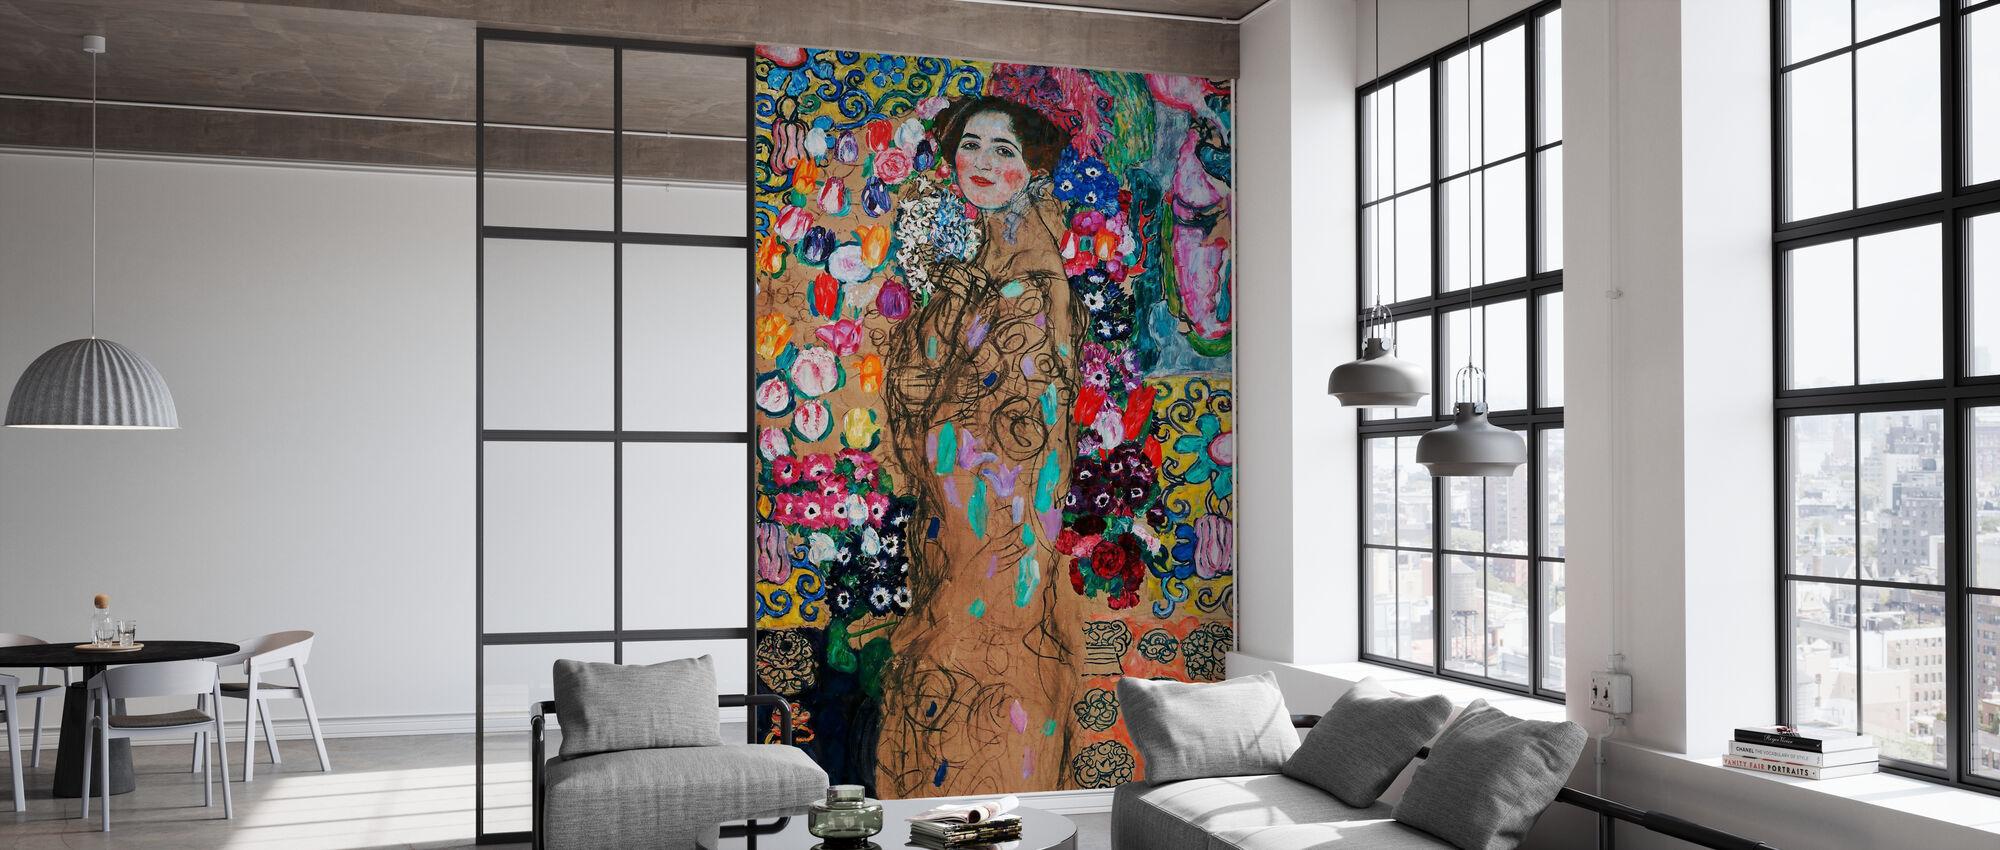 Portrait of Maria Munk - Infographics - Wallpaper - Office